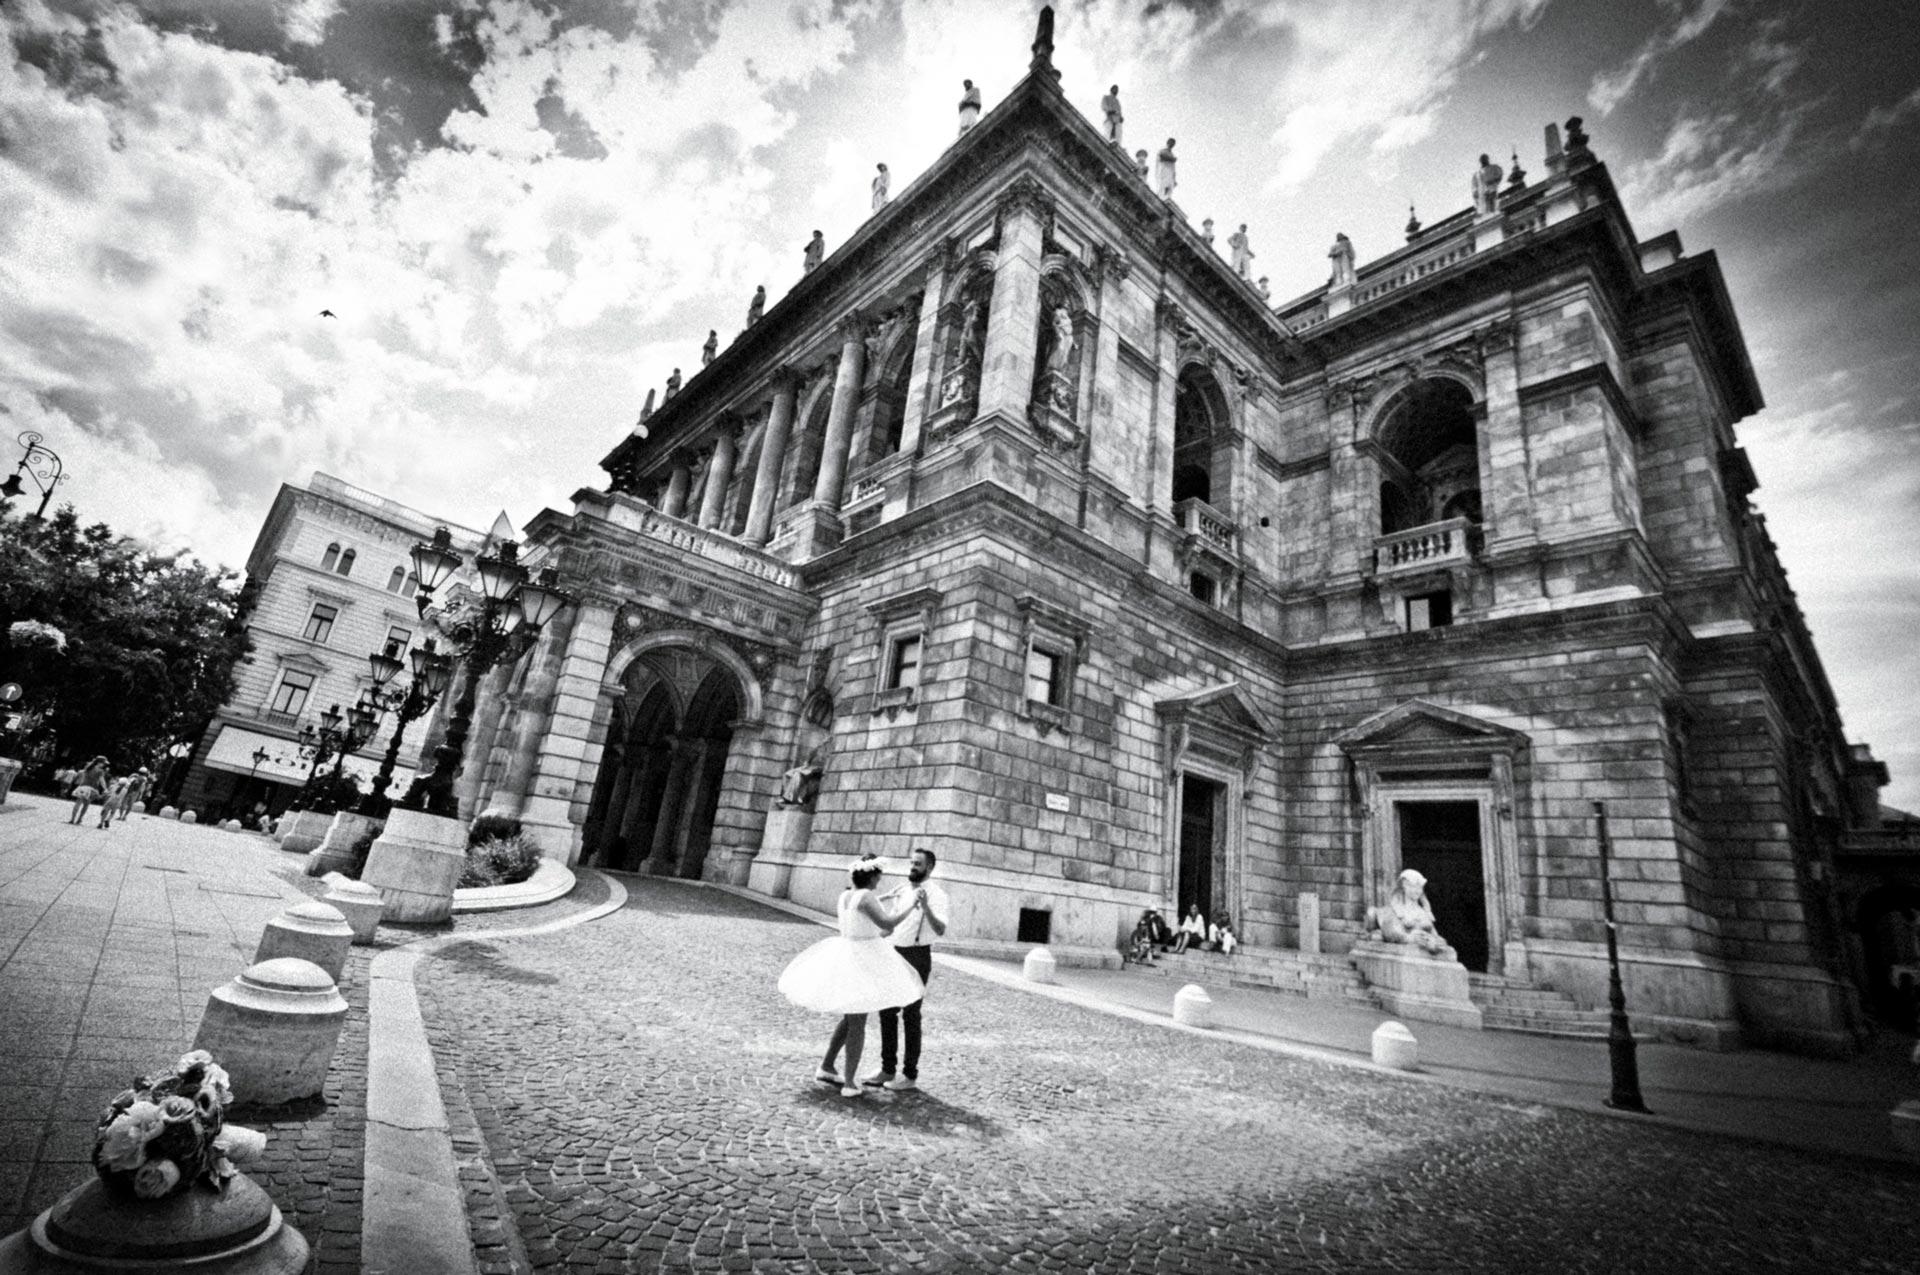 Elopement and honeymoon in Budapest - romantic city adventure wedding